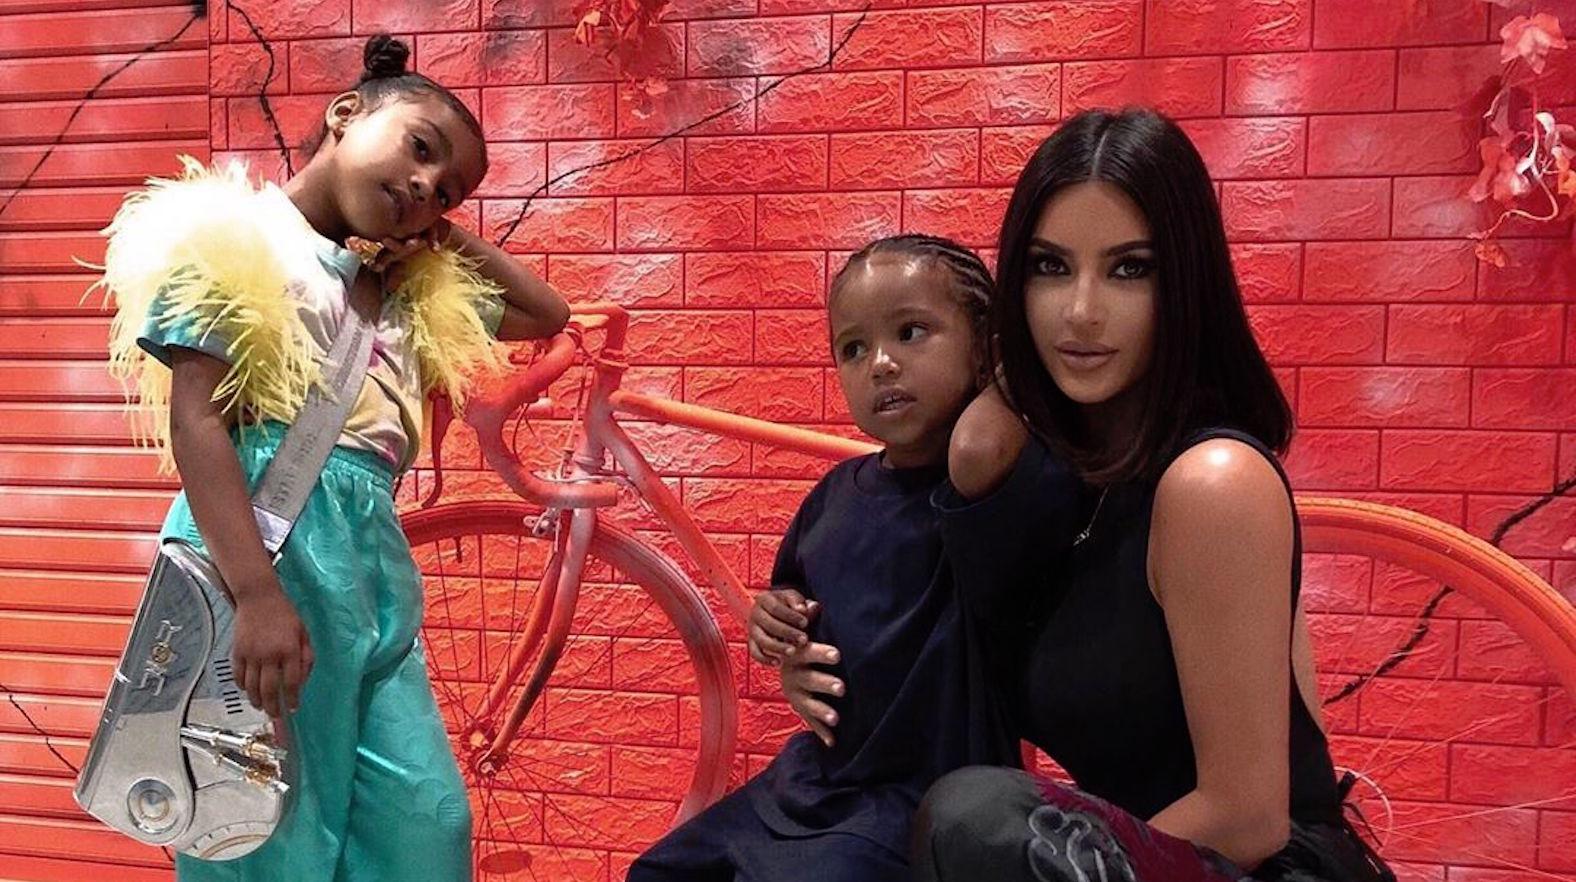 pure asiatico garcinia khloe kardashian